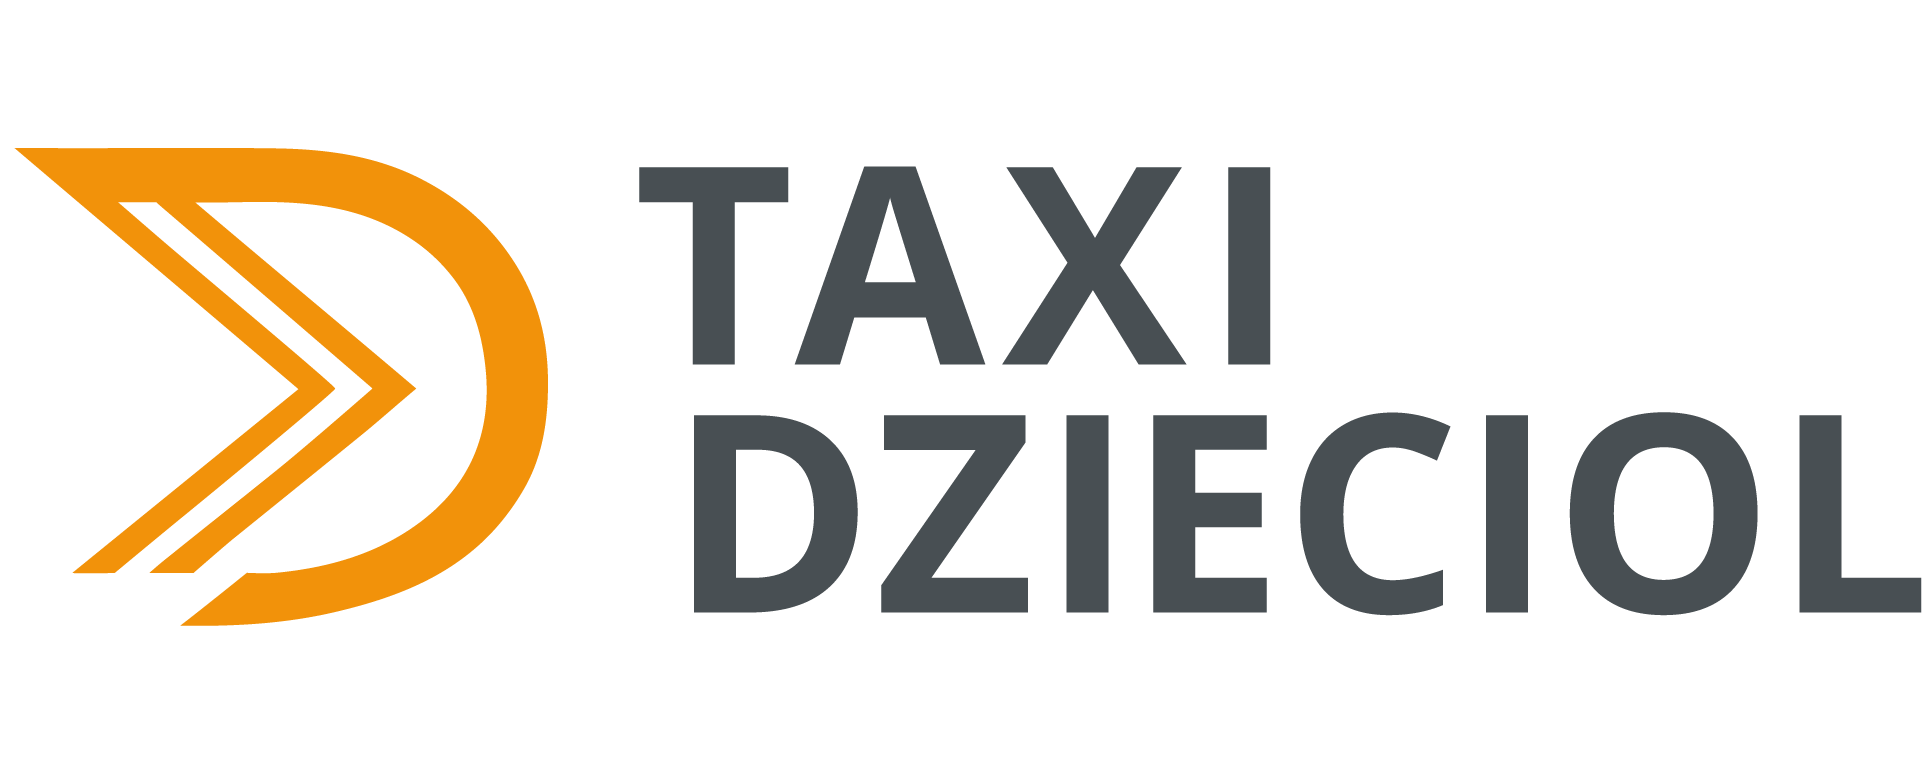 Taxi Dzieciol